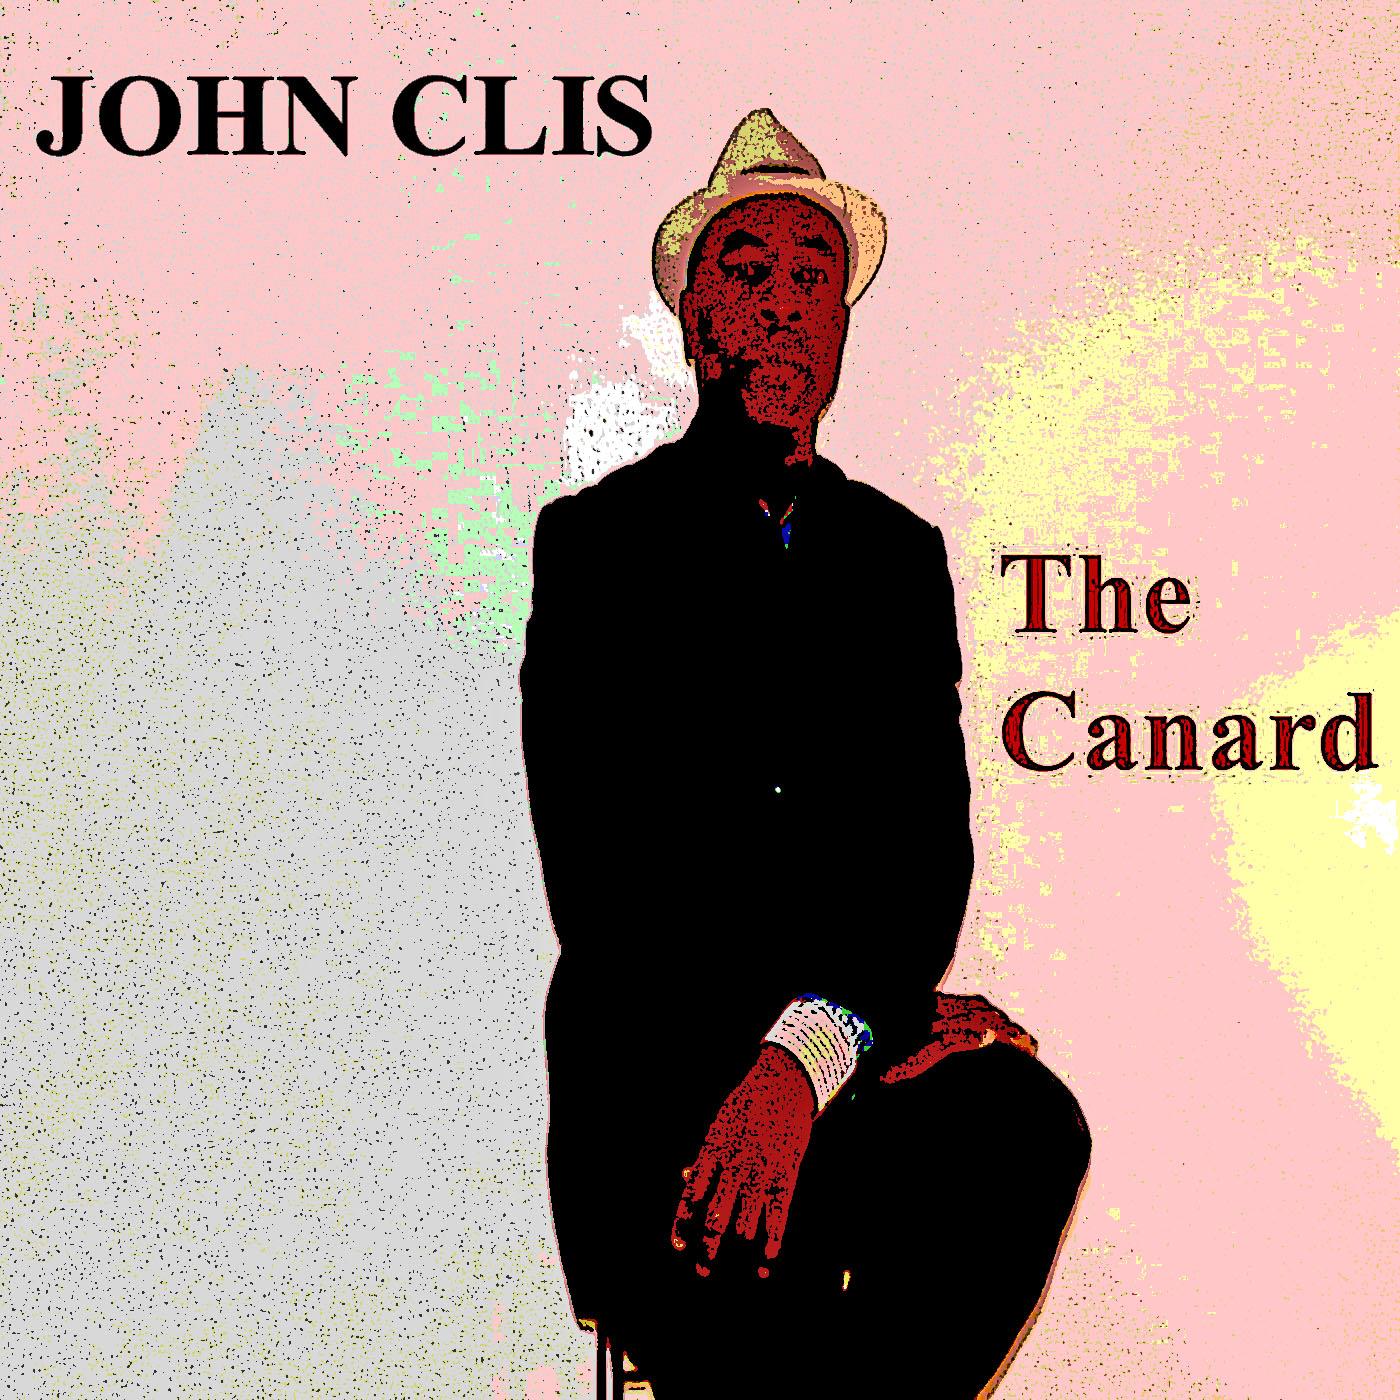 https://0201.nccdn.net/1_2/000/000/137/da6/John-Clis---The-Canard---Photo.jpg